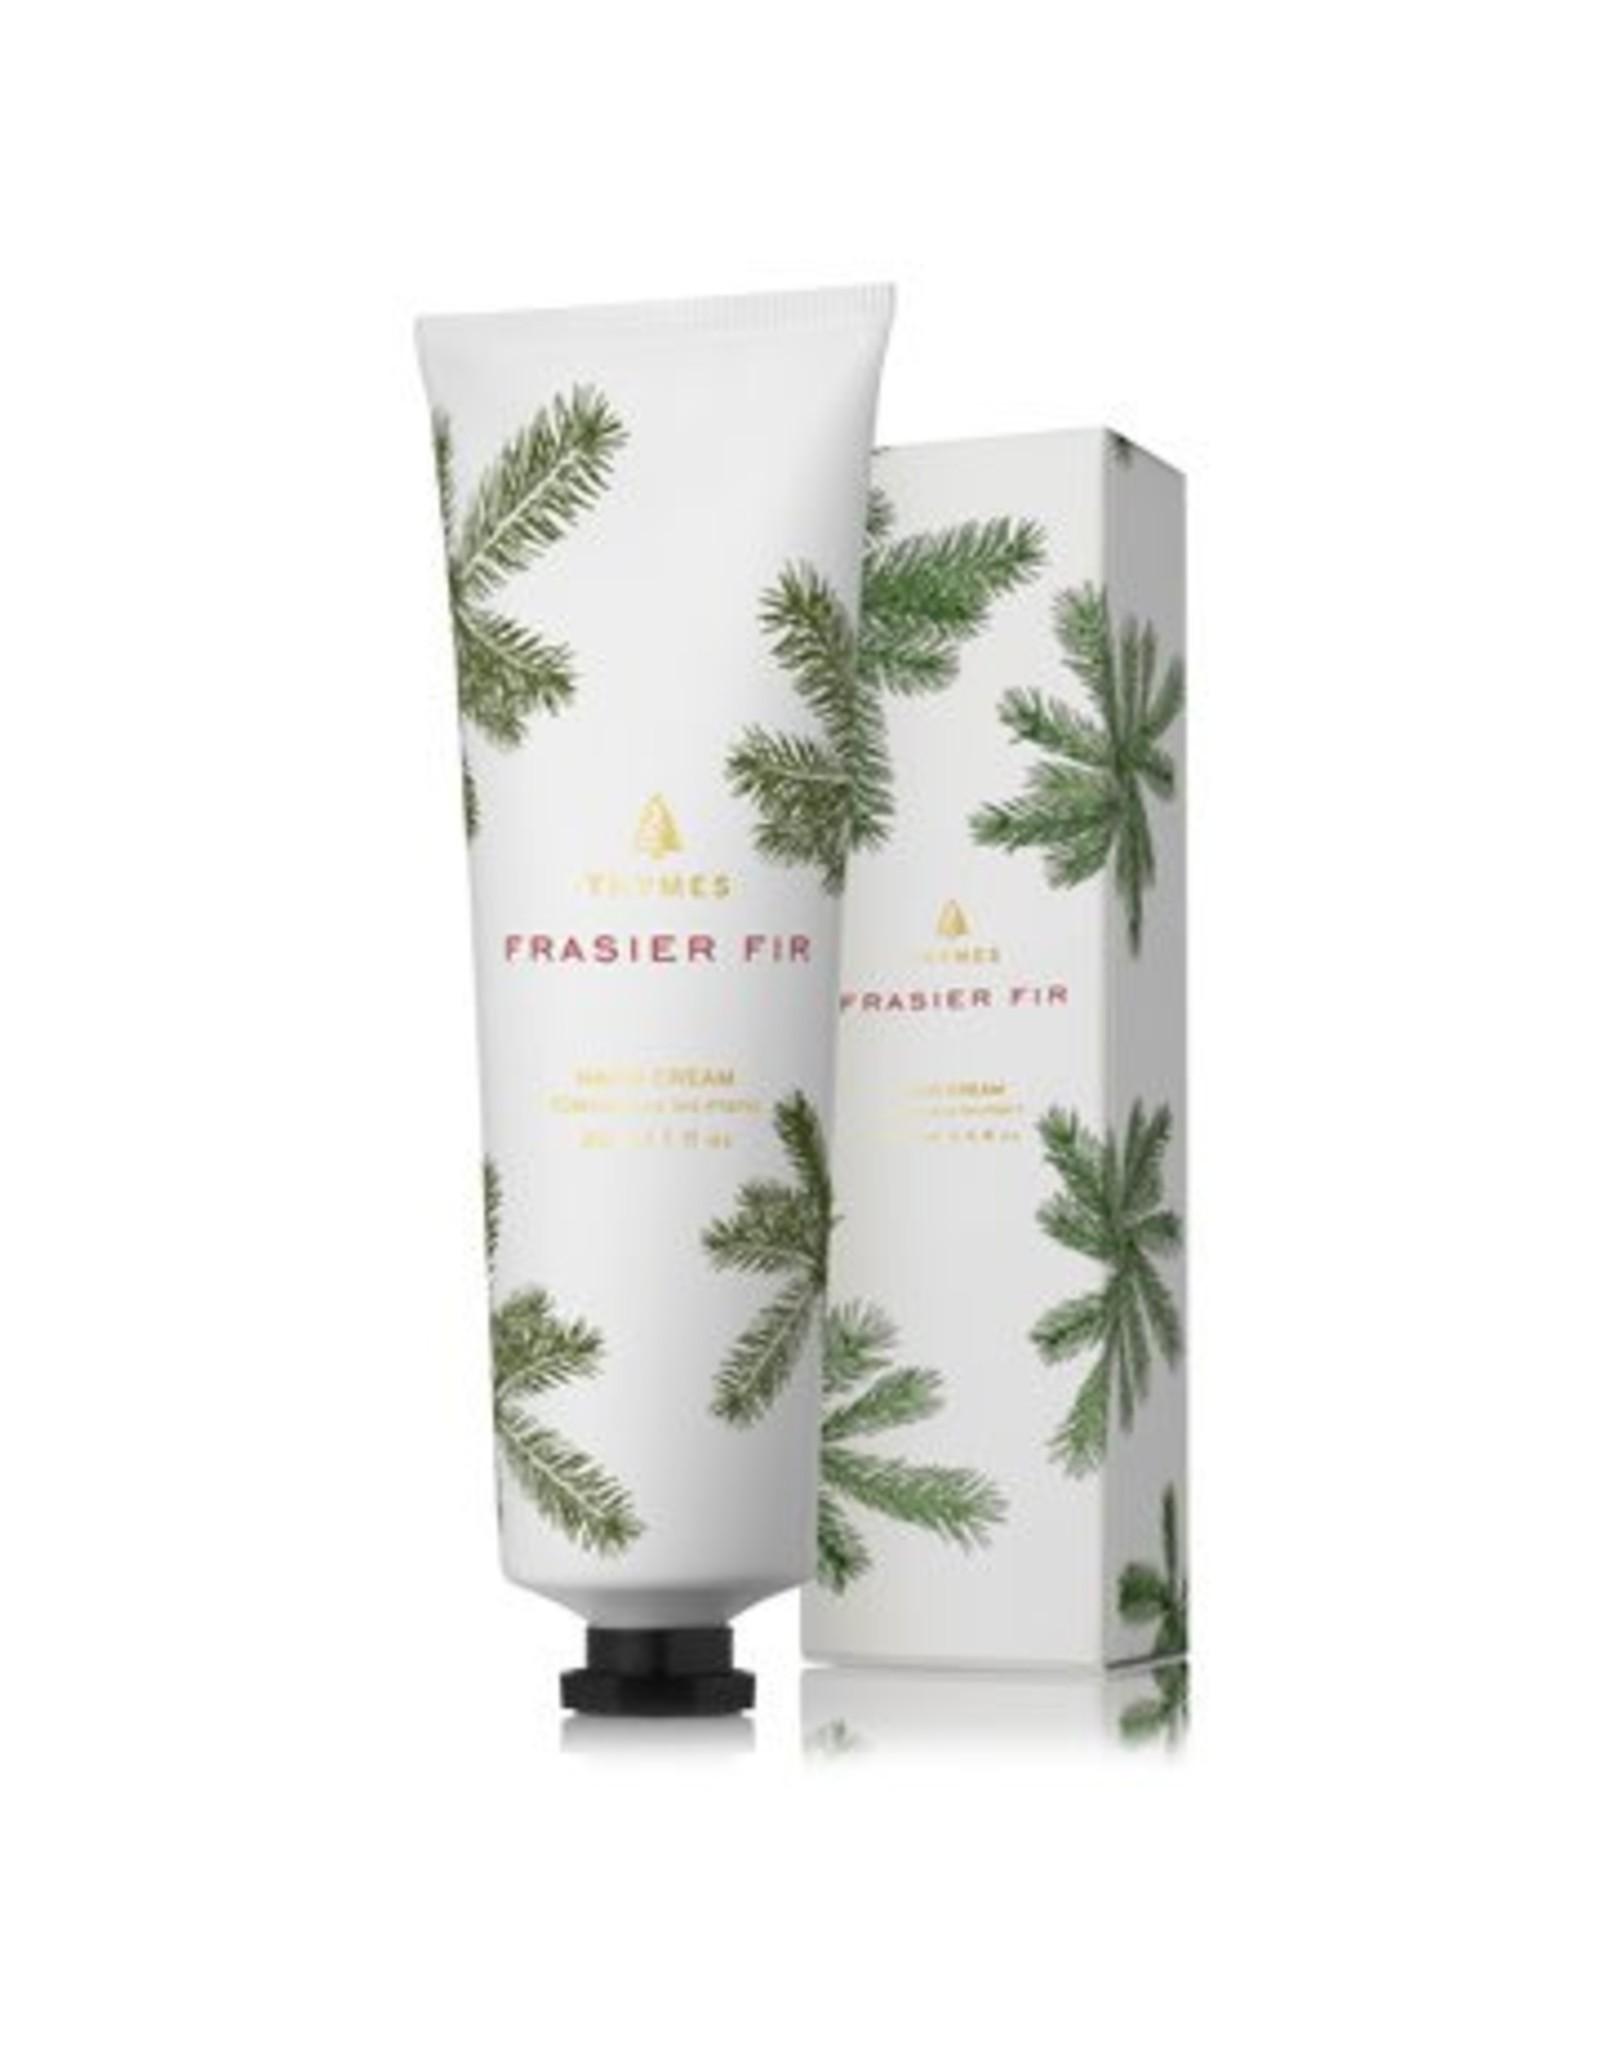 Thymes Frasier Fir Hand Cream